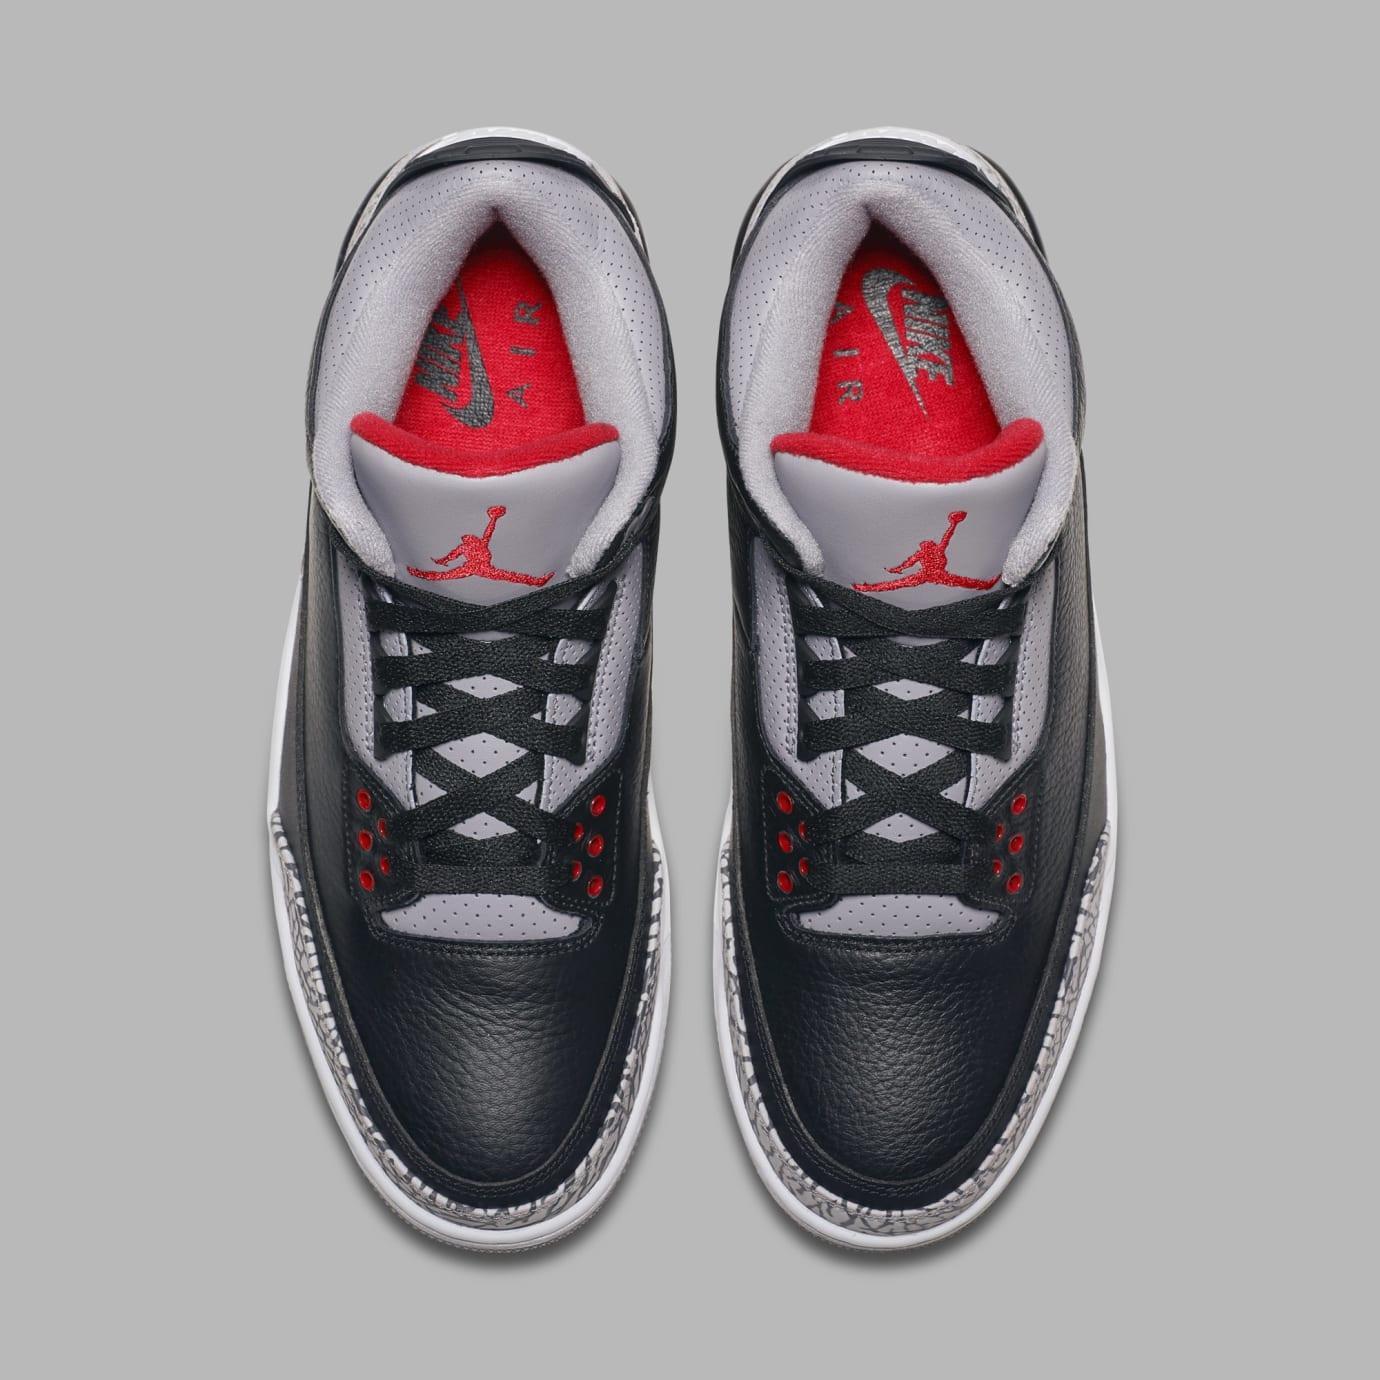 Air Jordan 3 Black/Cement Grey-White-Fire Red 854262-001 (Top)